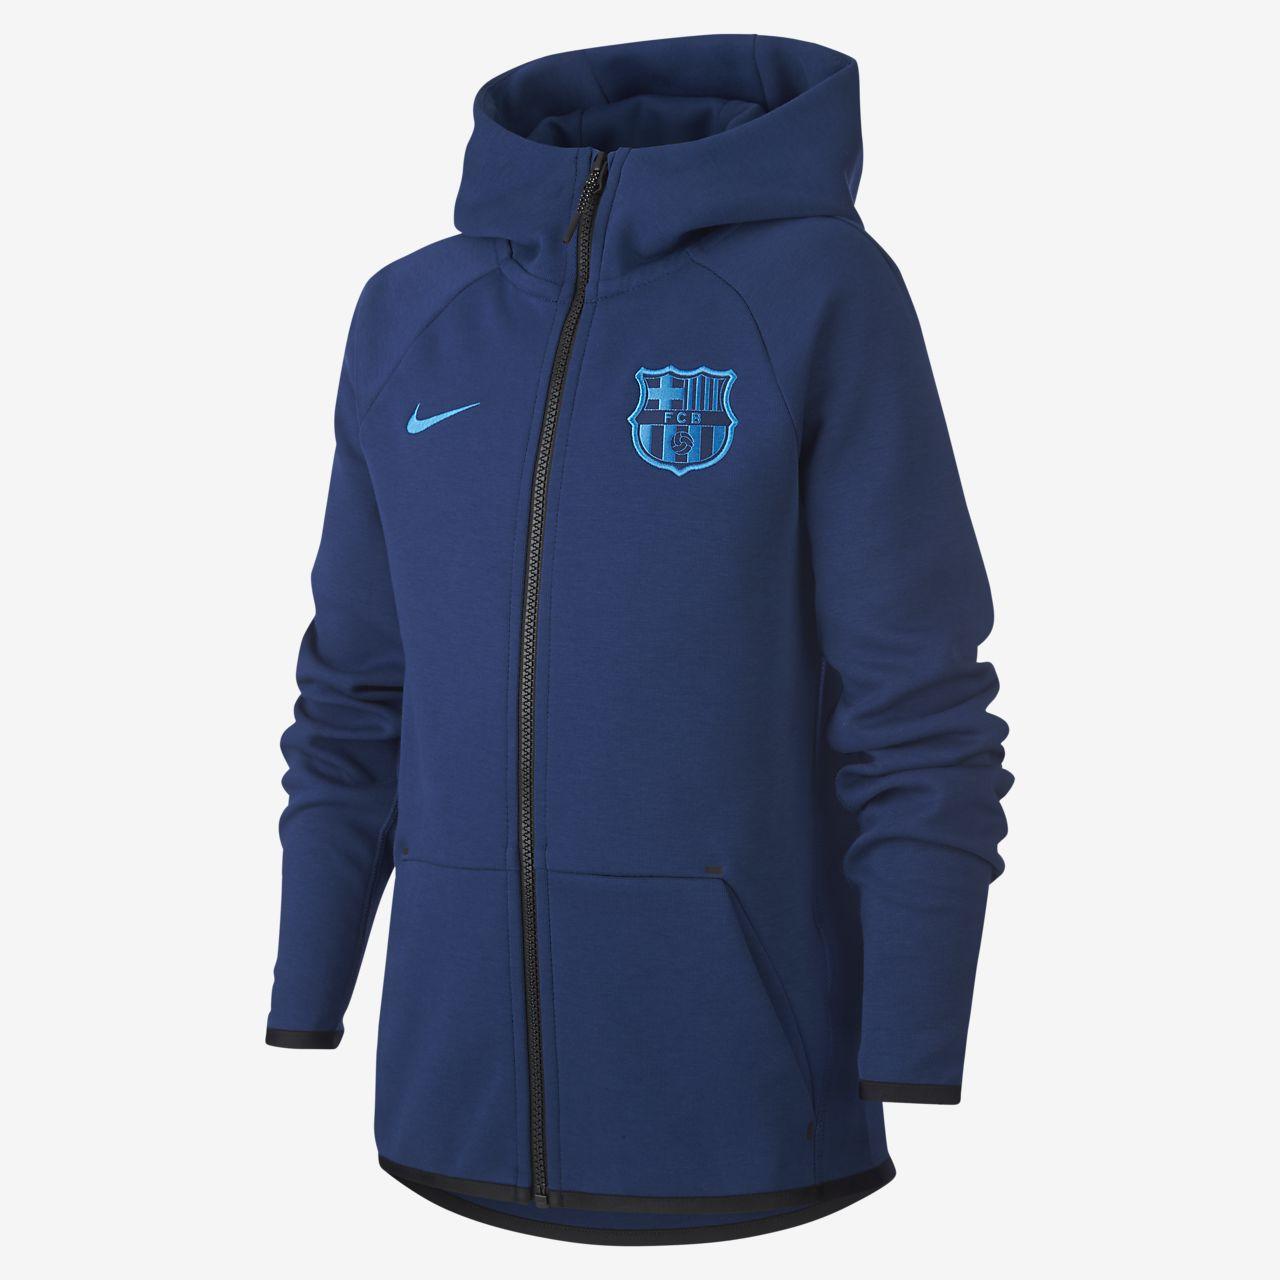 98ad7cace6307 ... FC Barcelona Tech Fleece Sudadera con capucha con cremallera completa -  Niño a